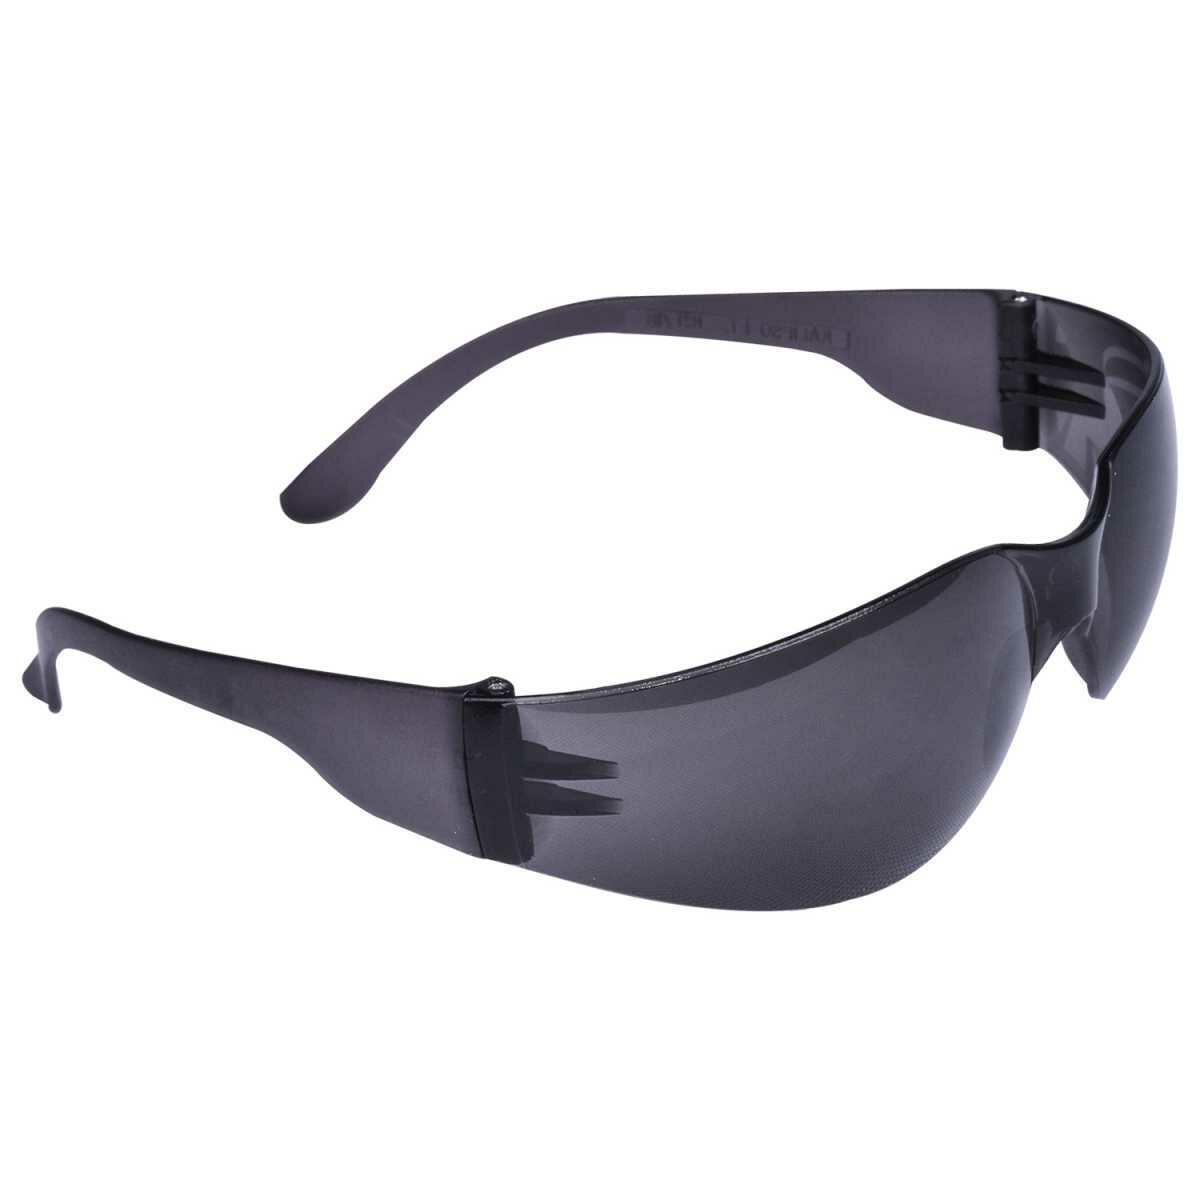 Óculos de Segurança Cinza Leopardo Kalipso